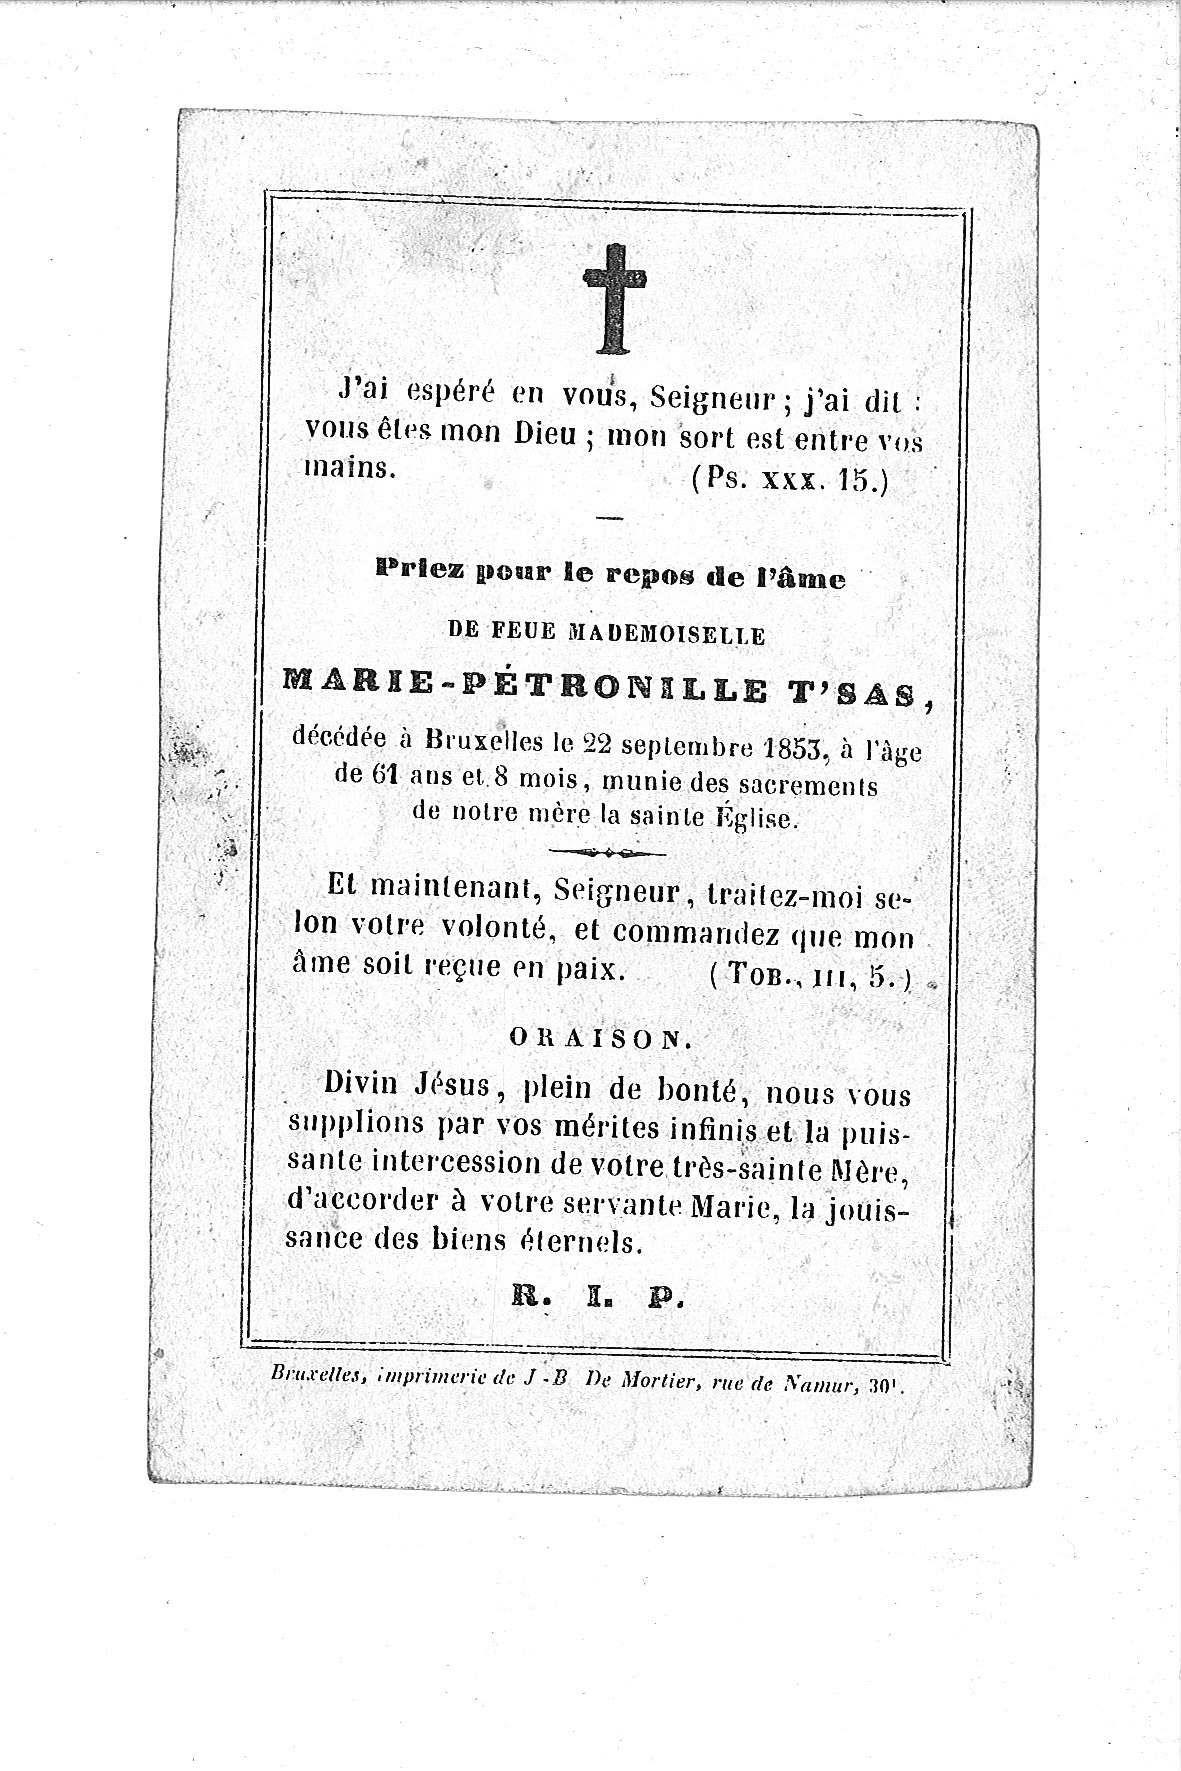 Marie-Petronille(1853)20091104172753_00039.jpg